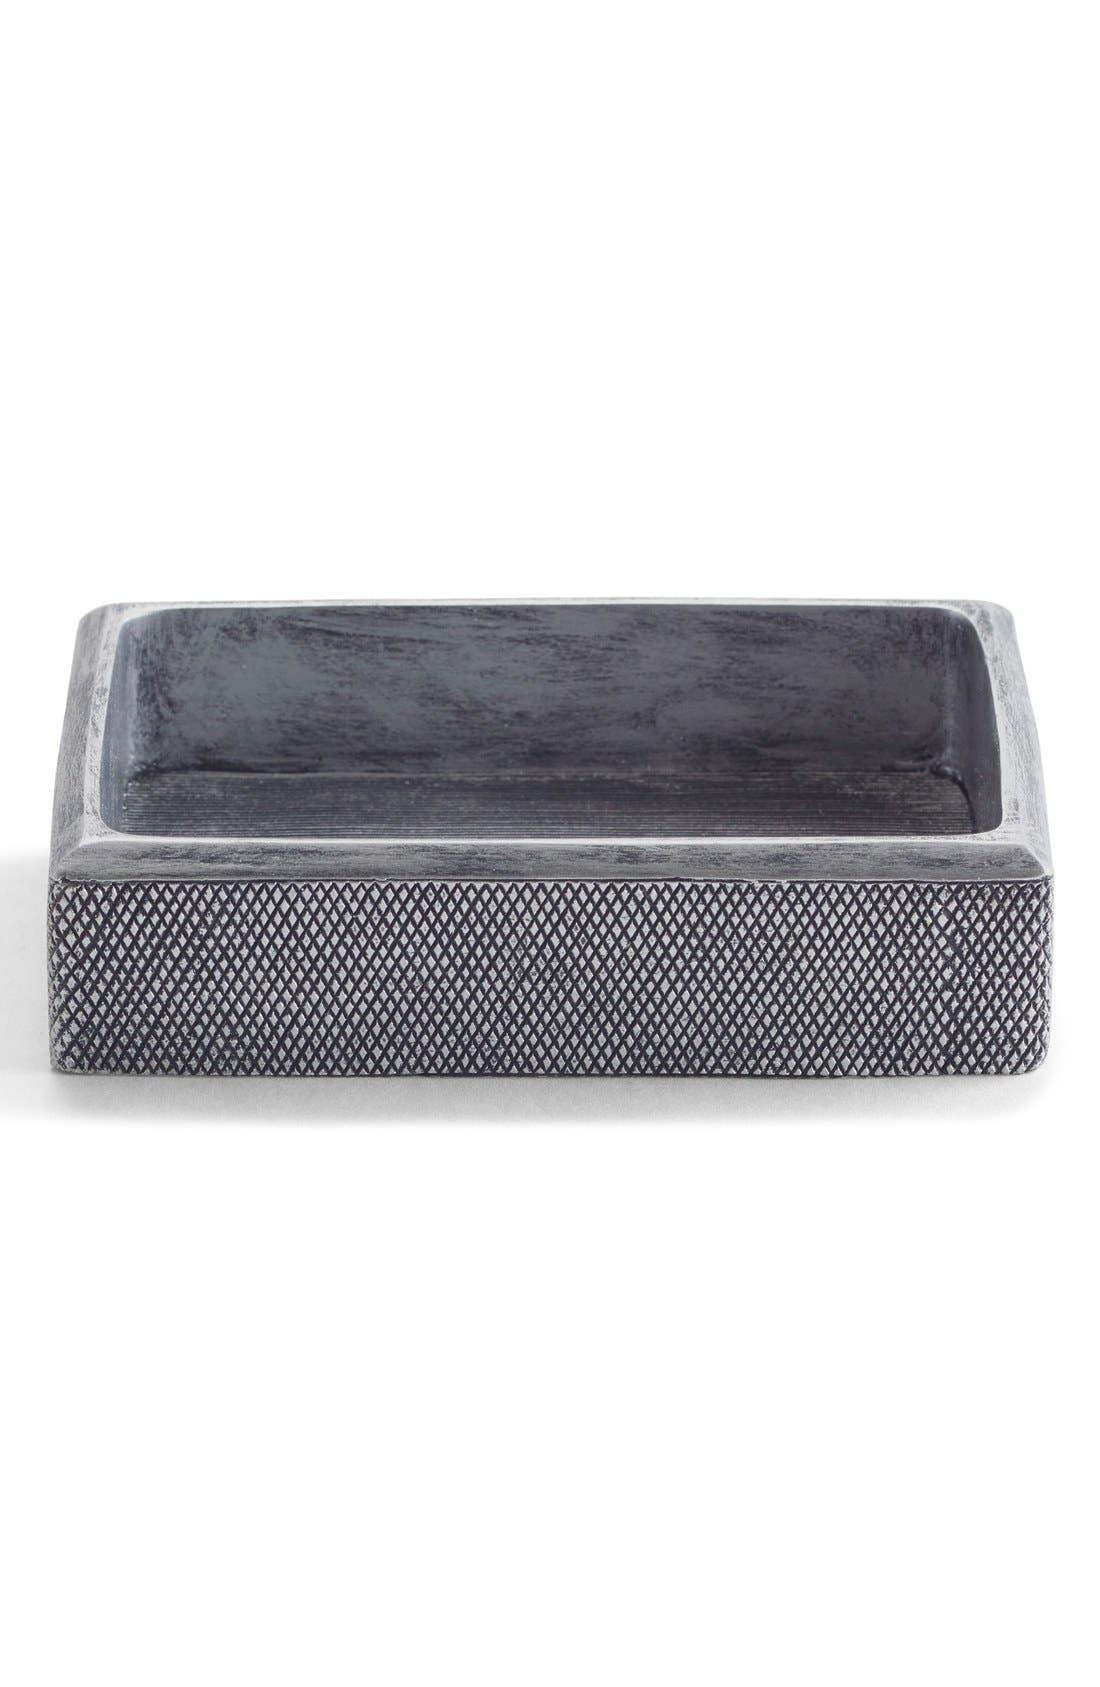 Main Image - KASSATEX Etched Soap Dish